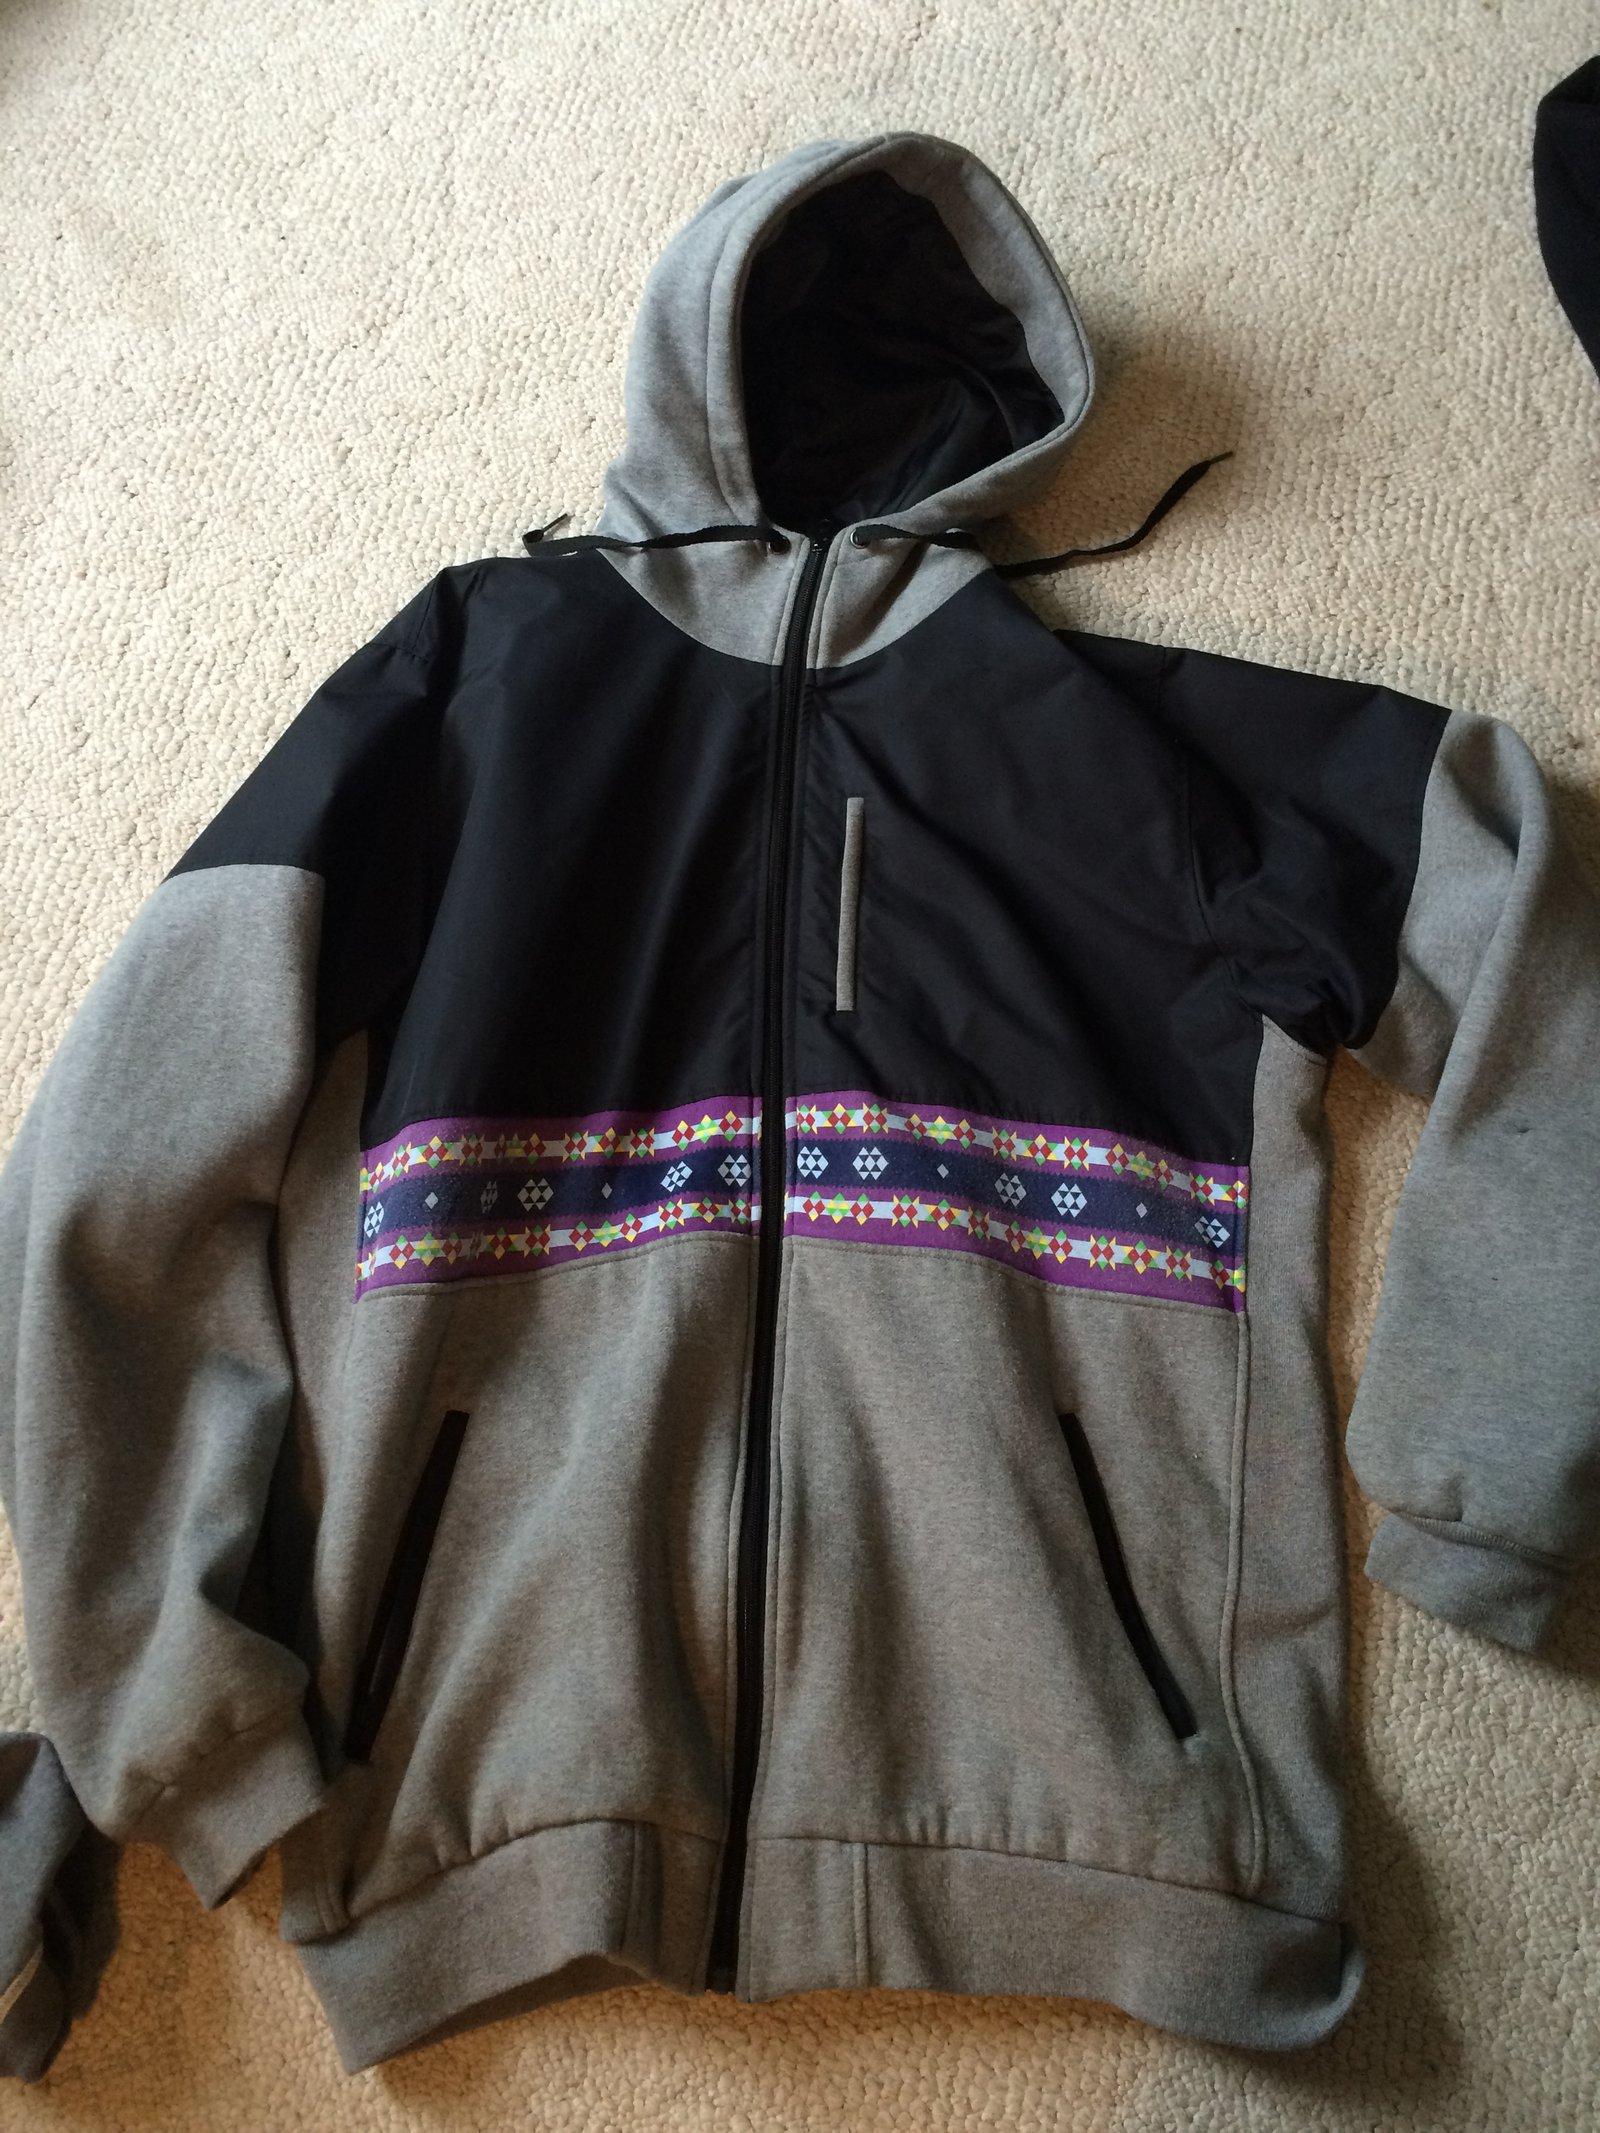 xxl jiberish jacket/ hoody